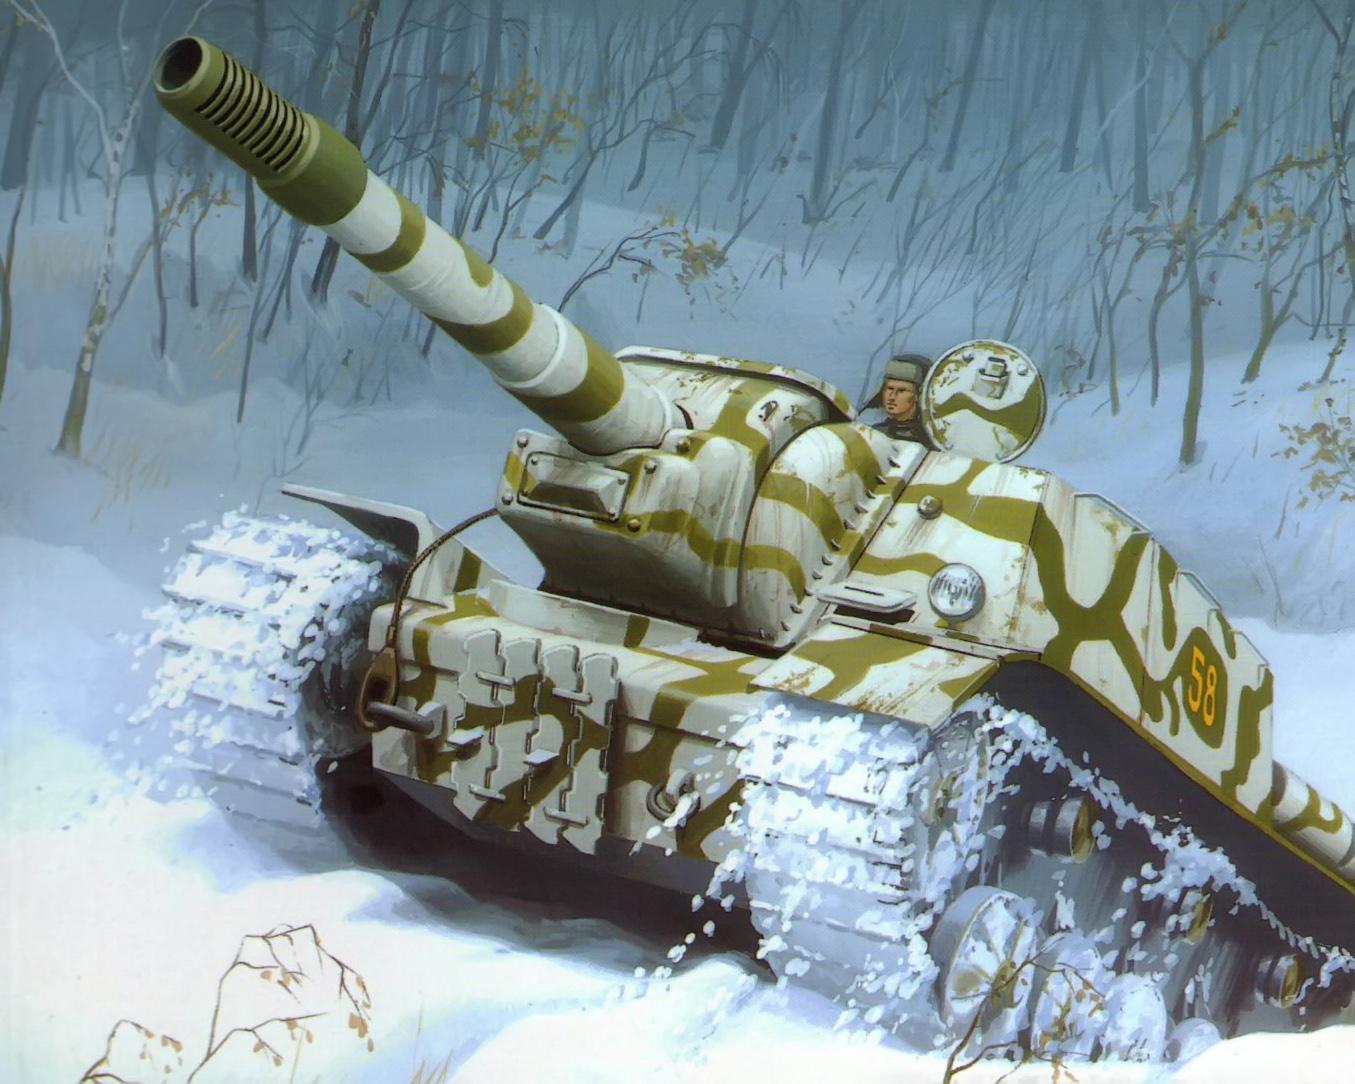 Wróbel Arkadiusz. САУ СУ-152.